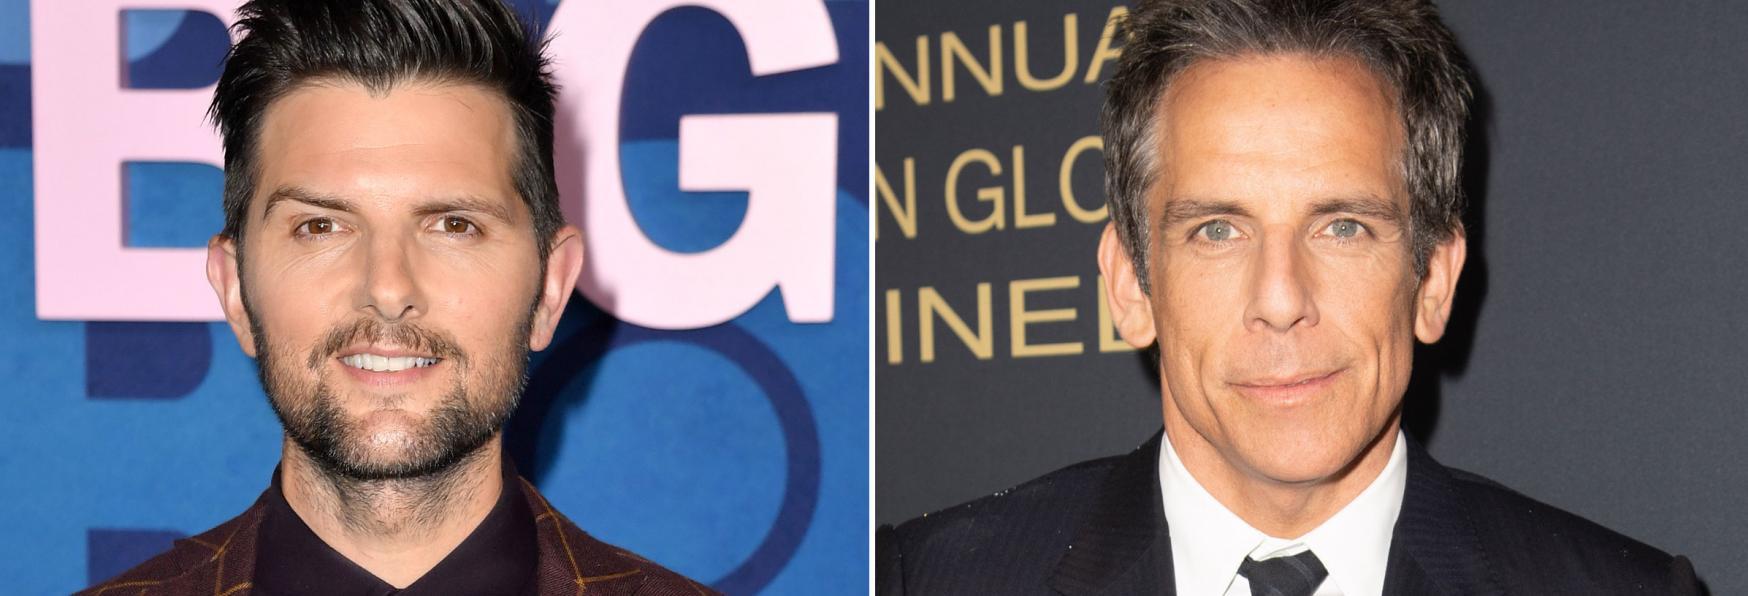 Severance: Apple ordina una nuova Serie TV Thriller con Adam Scott